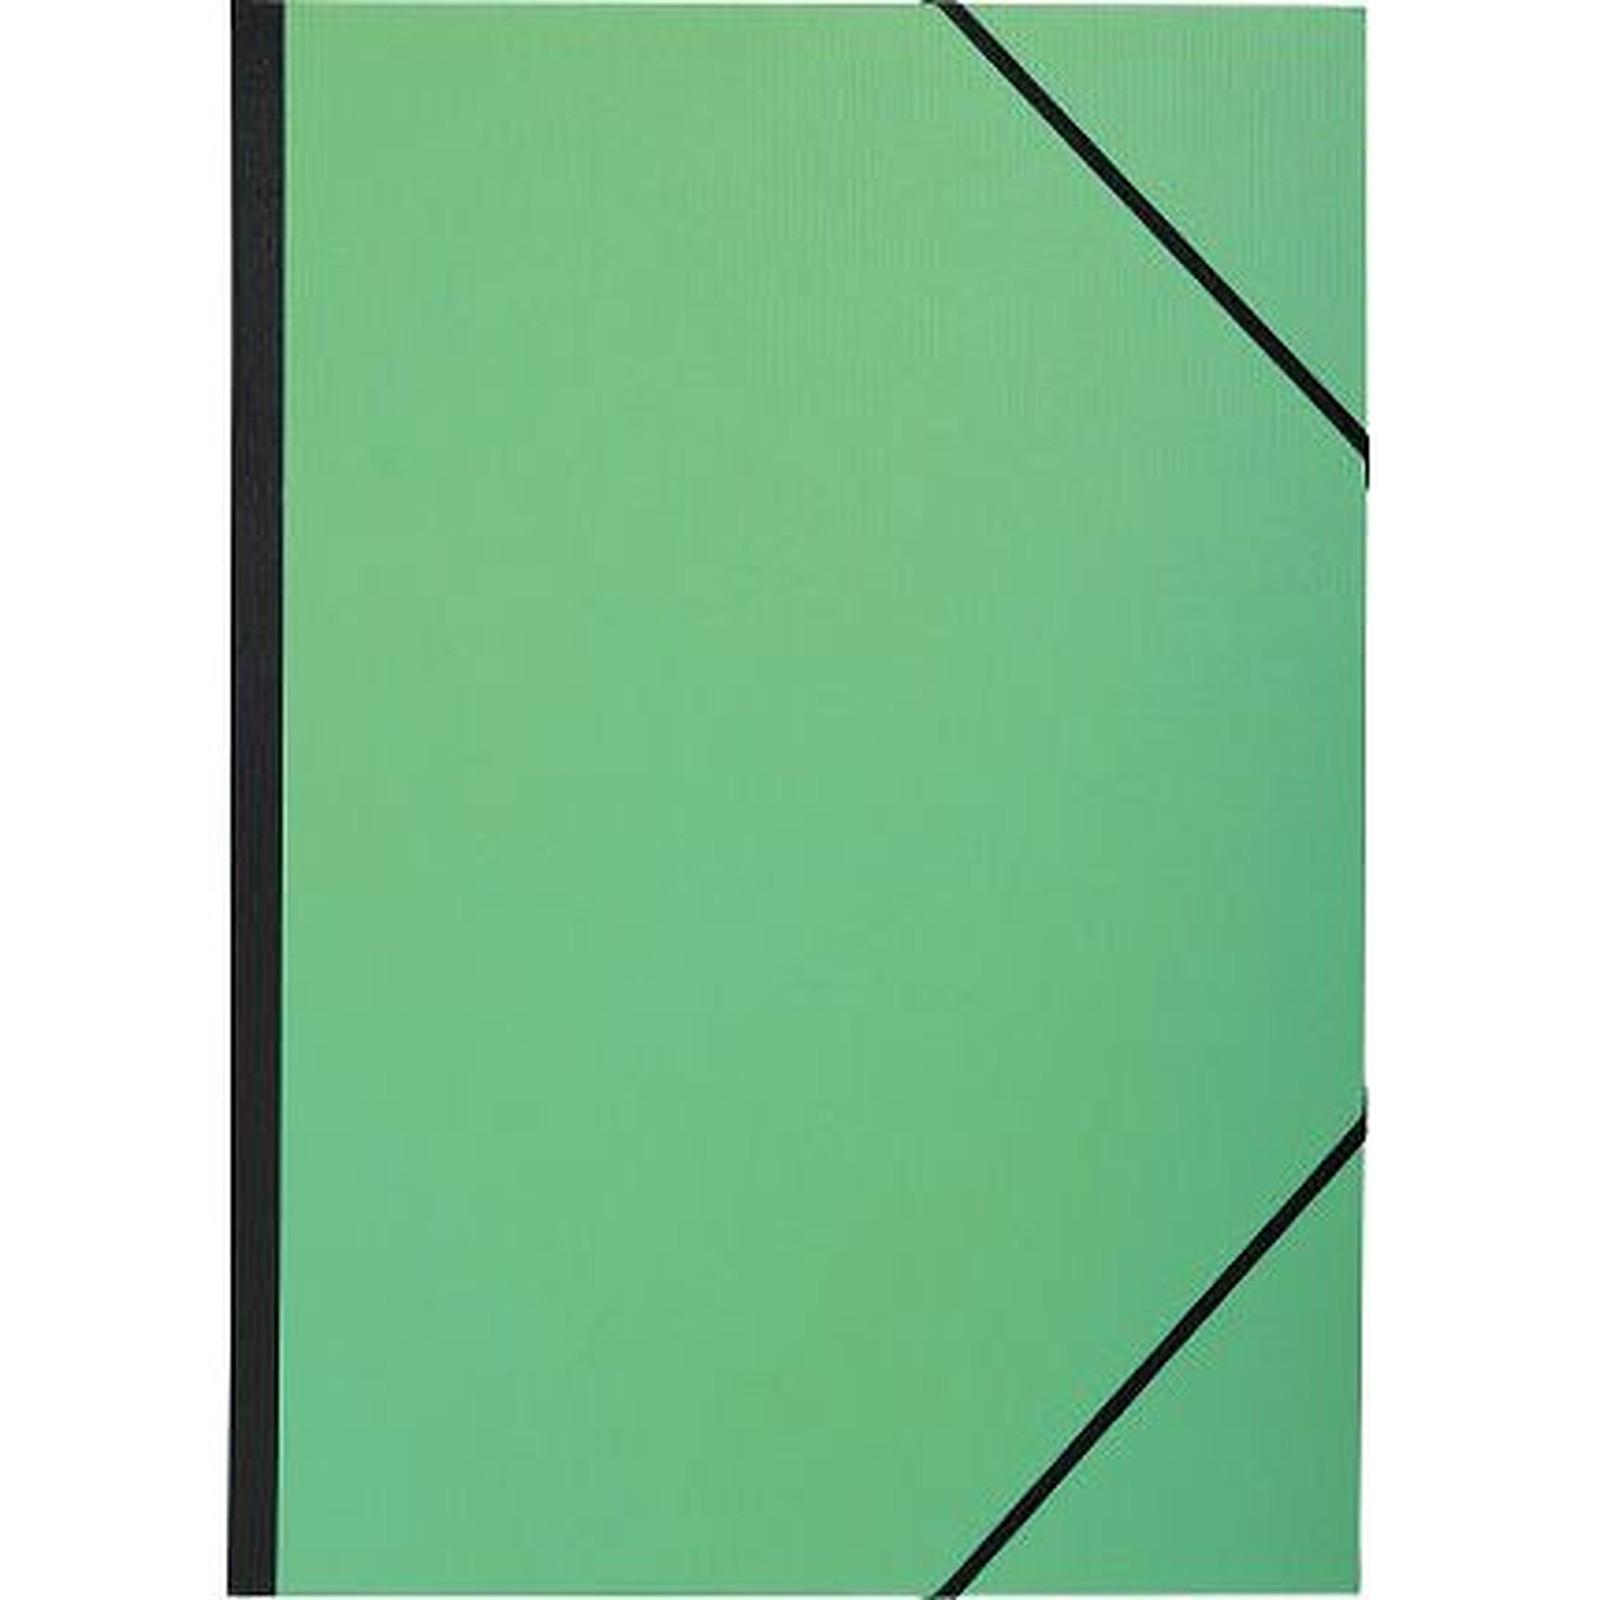 Exacompta Carton à dessin  verni vert et noir 26 x 33 cm